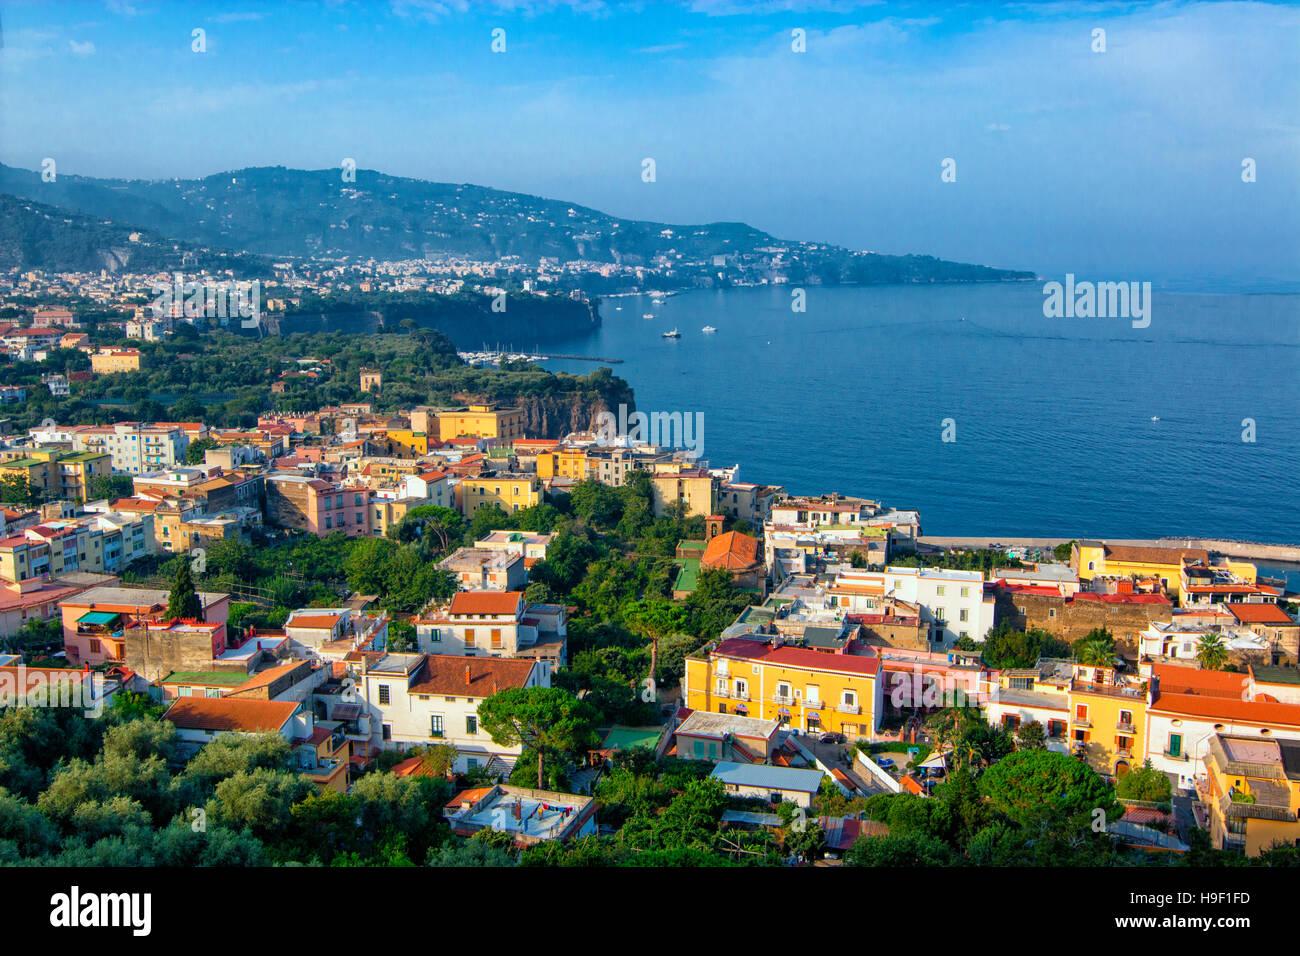 Sorrento, Gulf of Naples, Campania, Italy - Stock Image